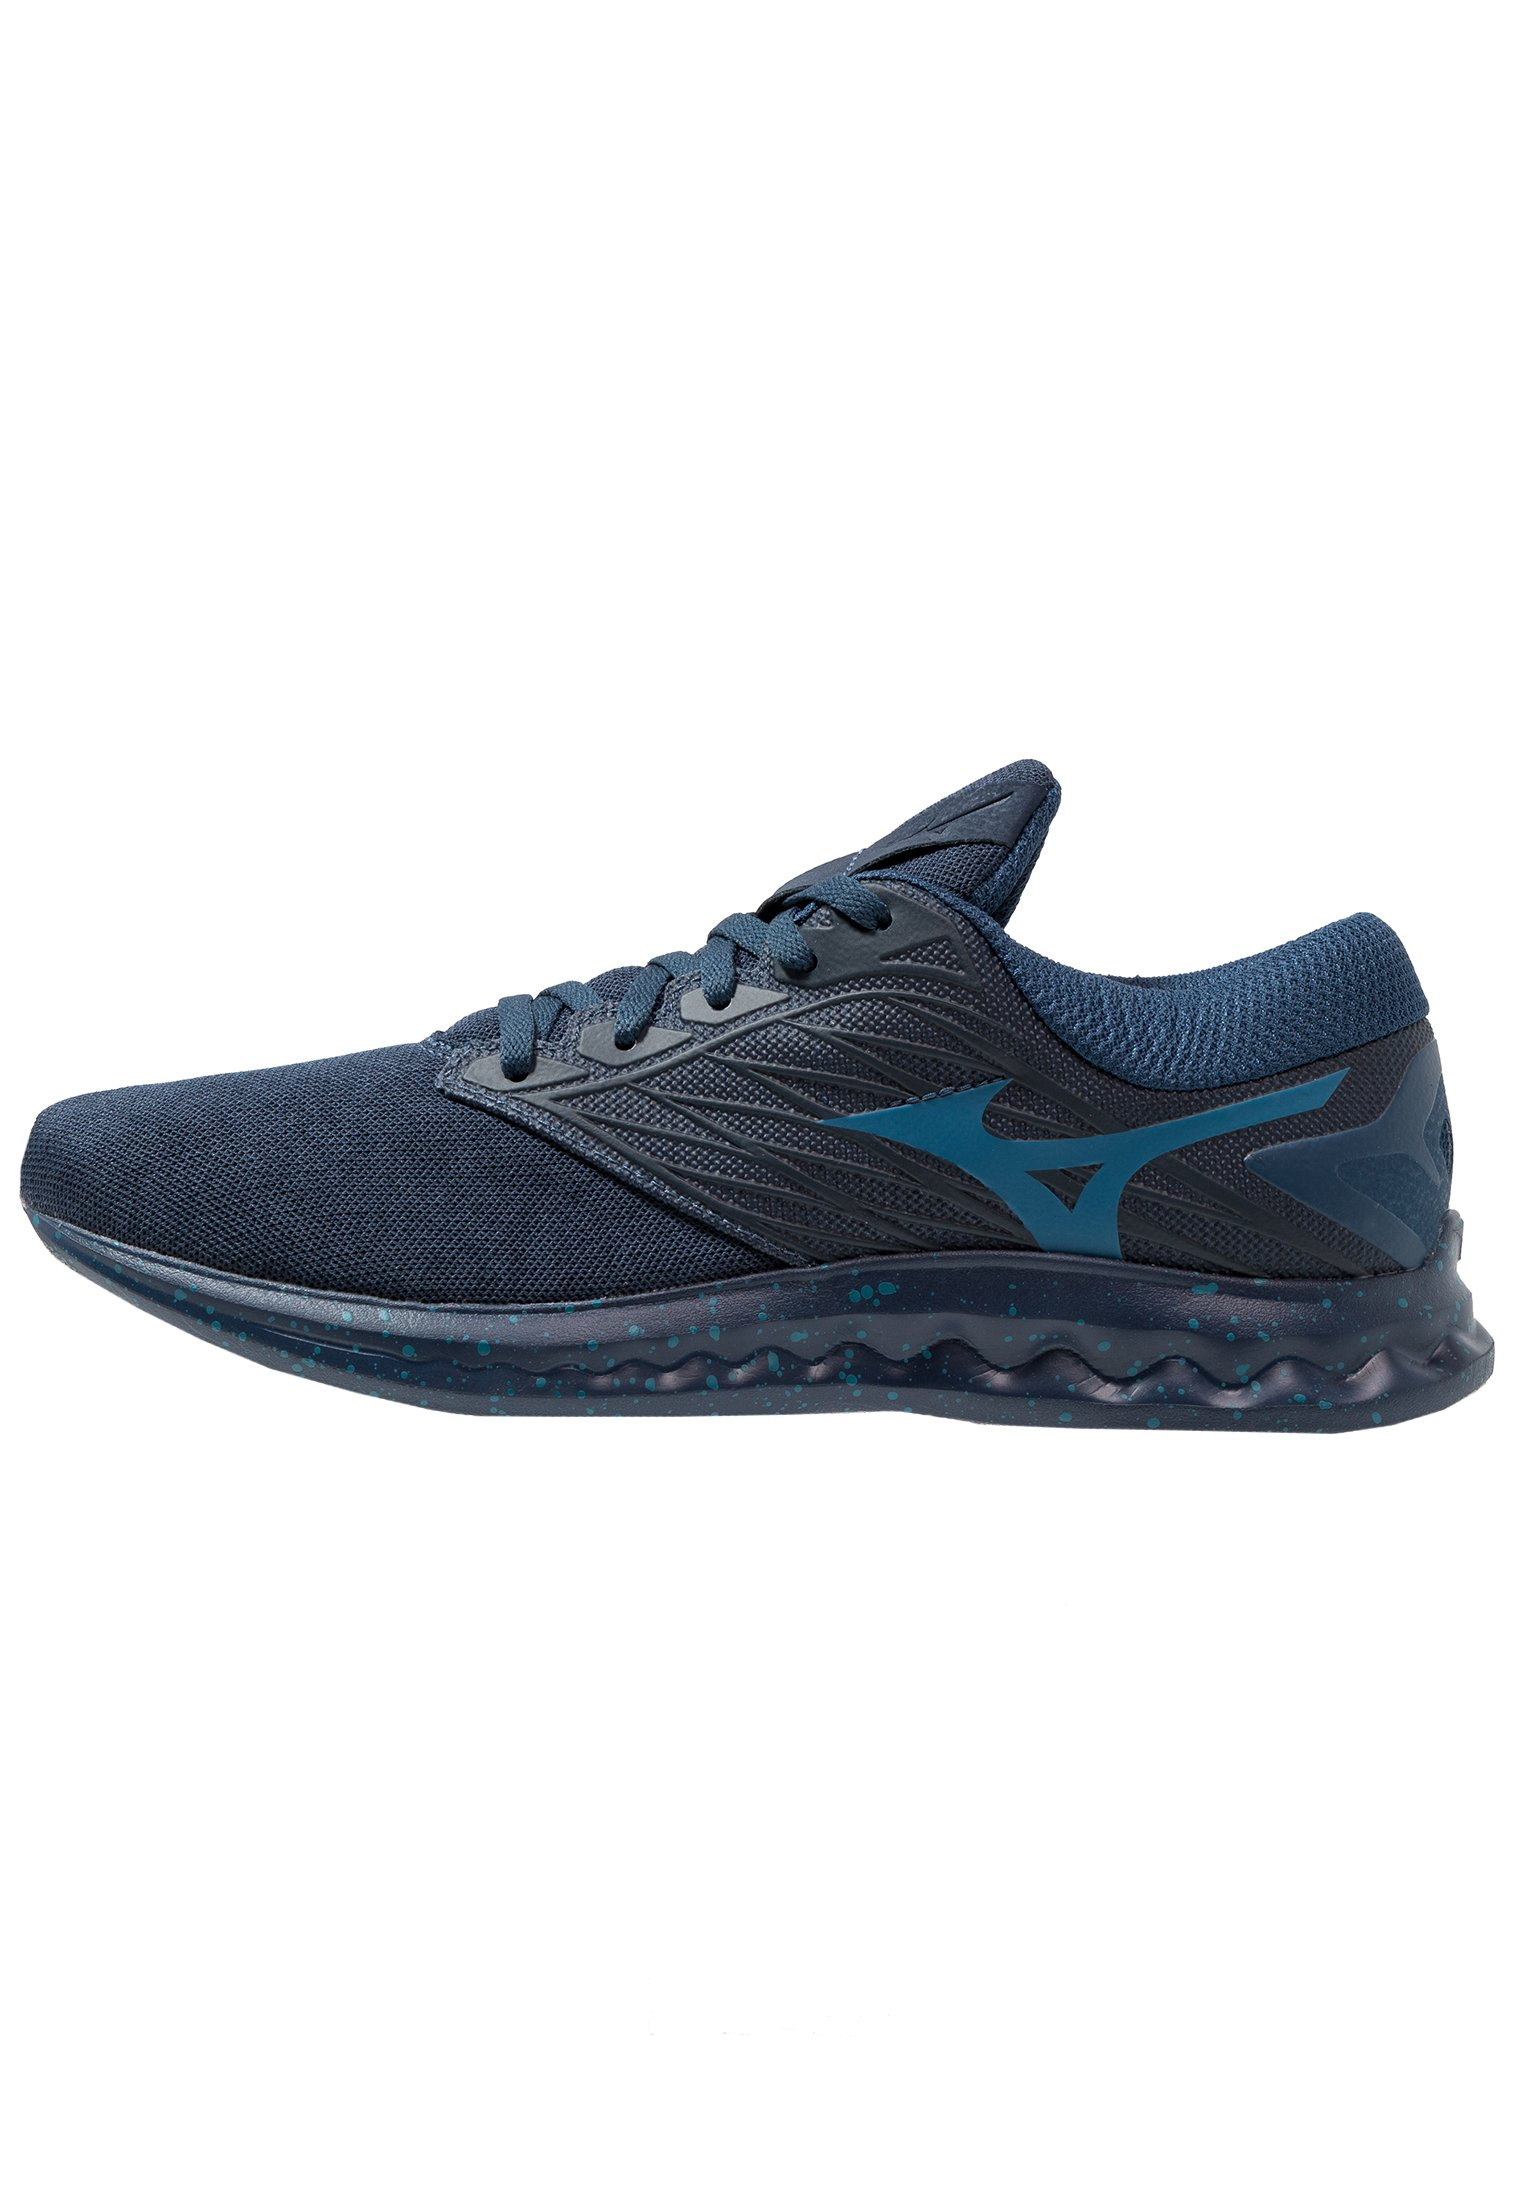 mizuno mens running shoes size 9 youth gold female watch zalando